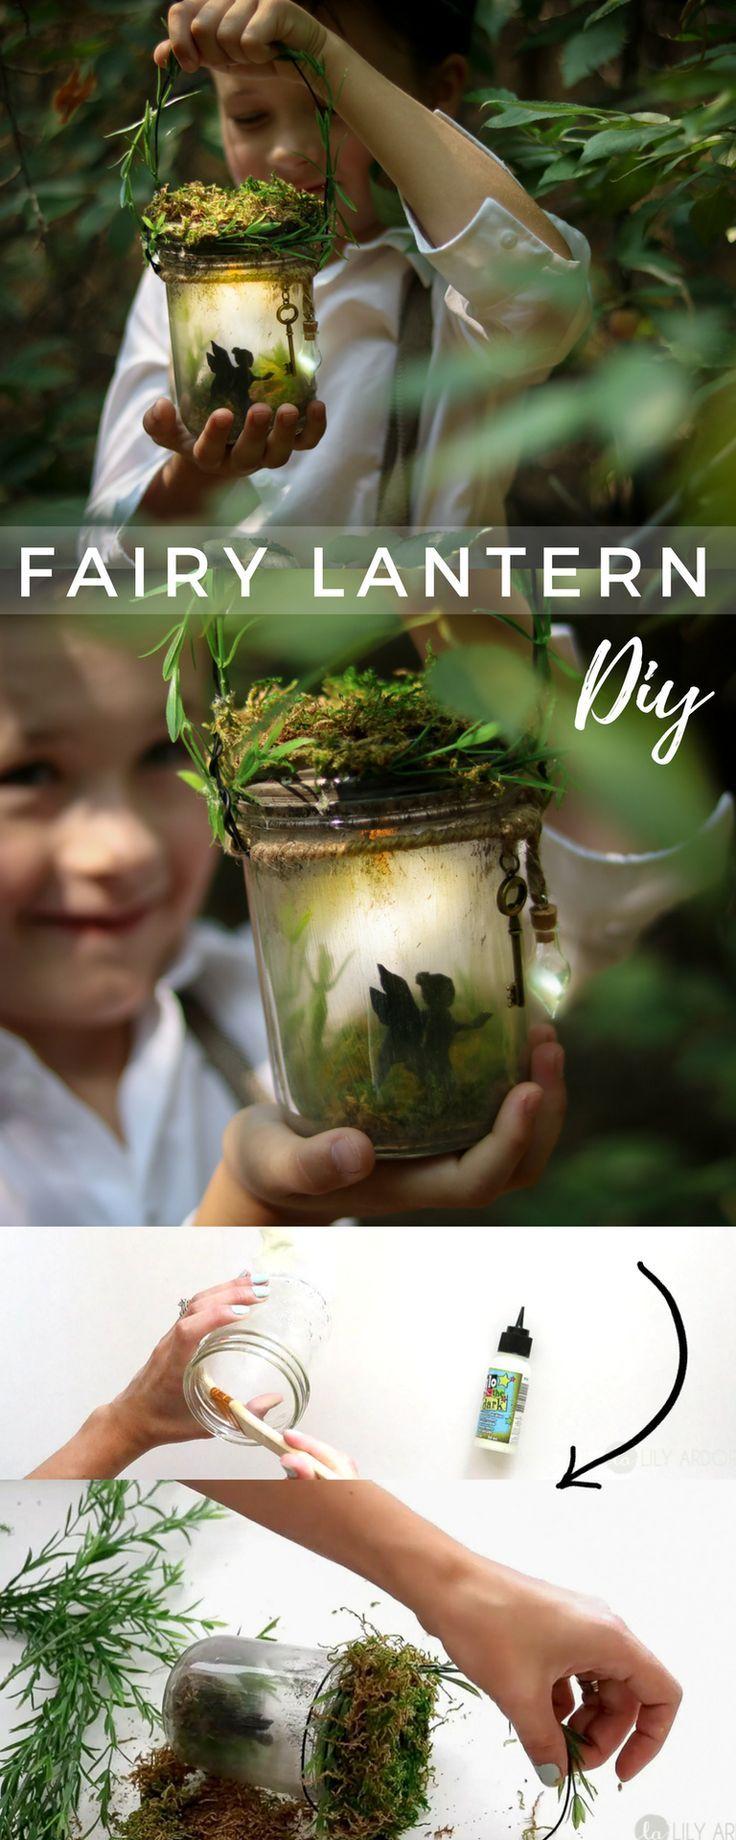 DIY Fairy Lantern Night Light - W/ On - Off Switch - It's fully portable and GLOWS SO PRETTY #diygarten